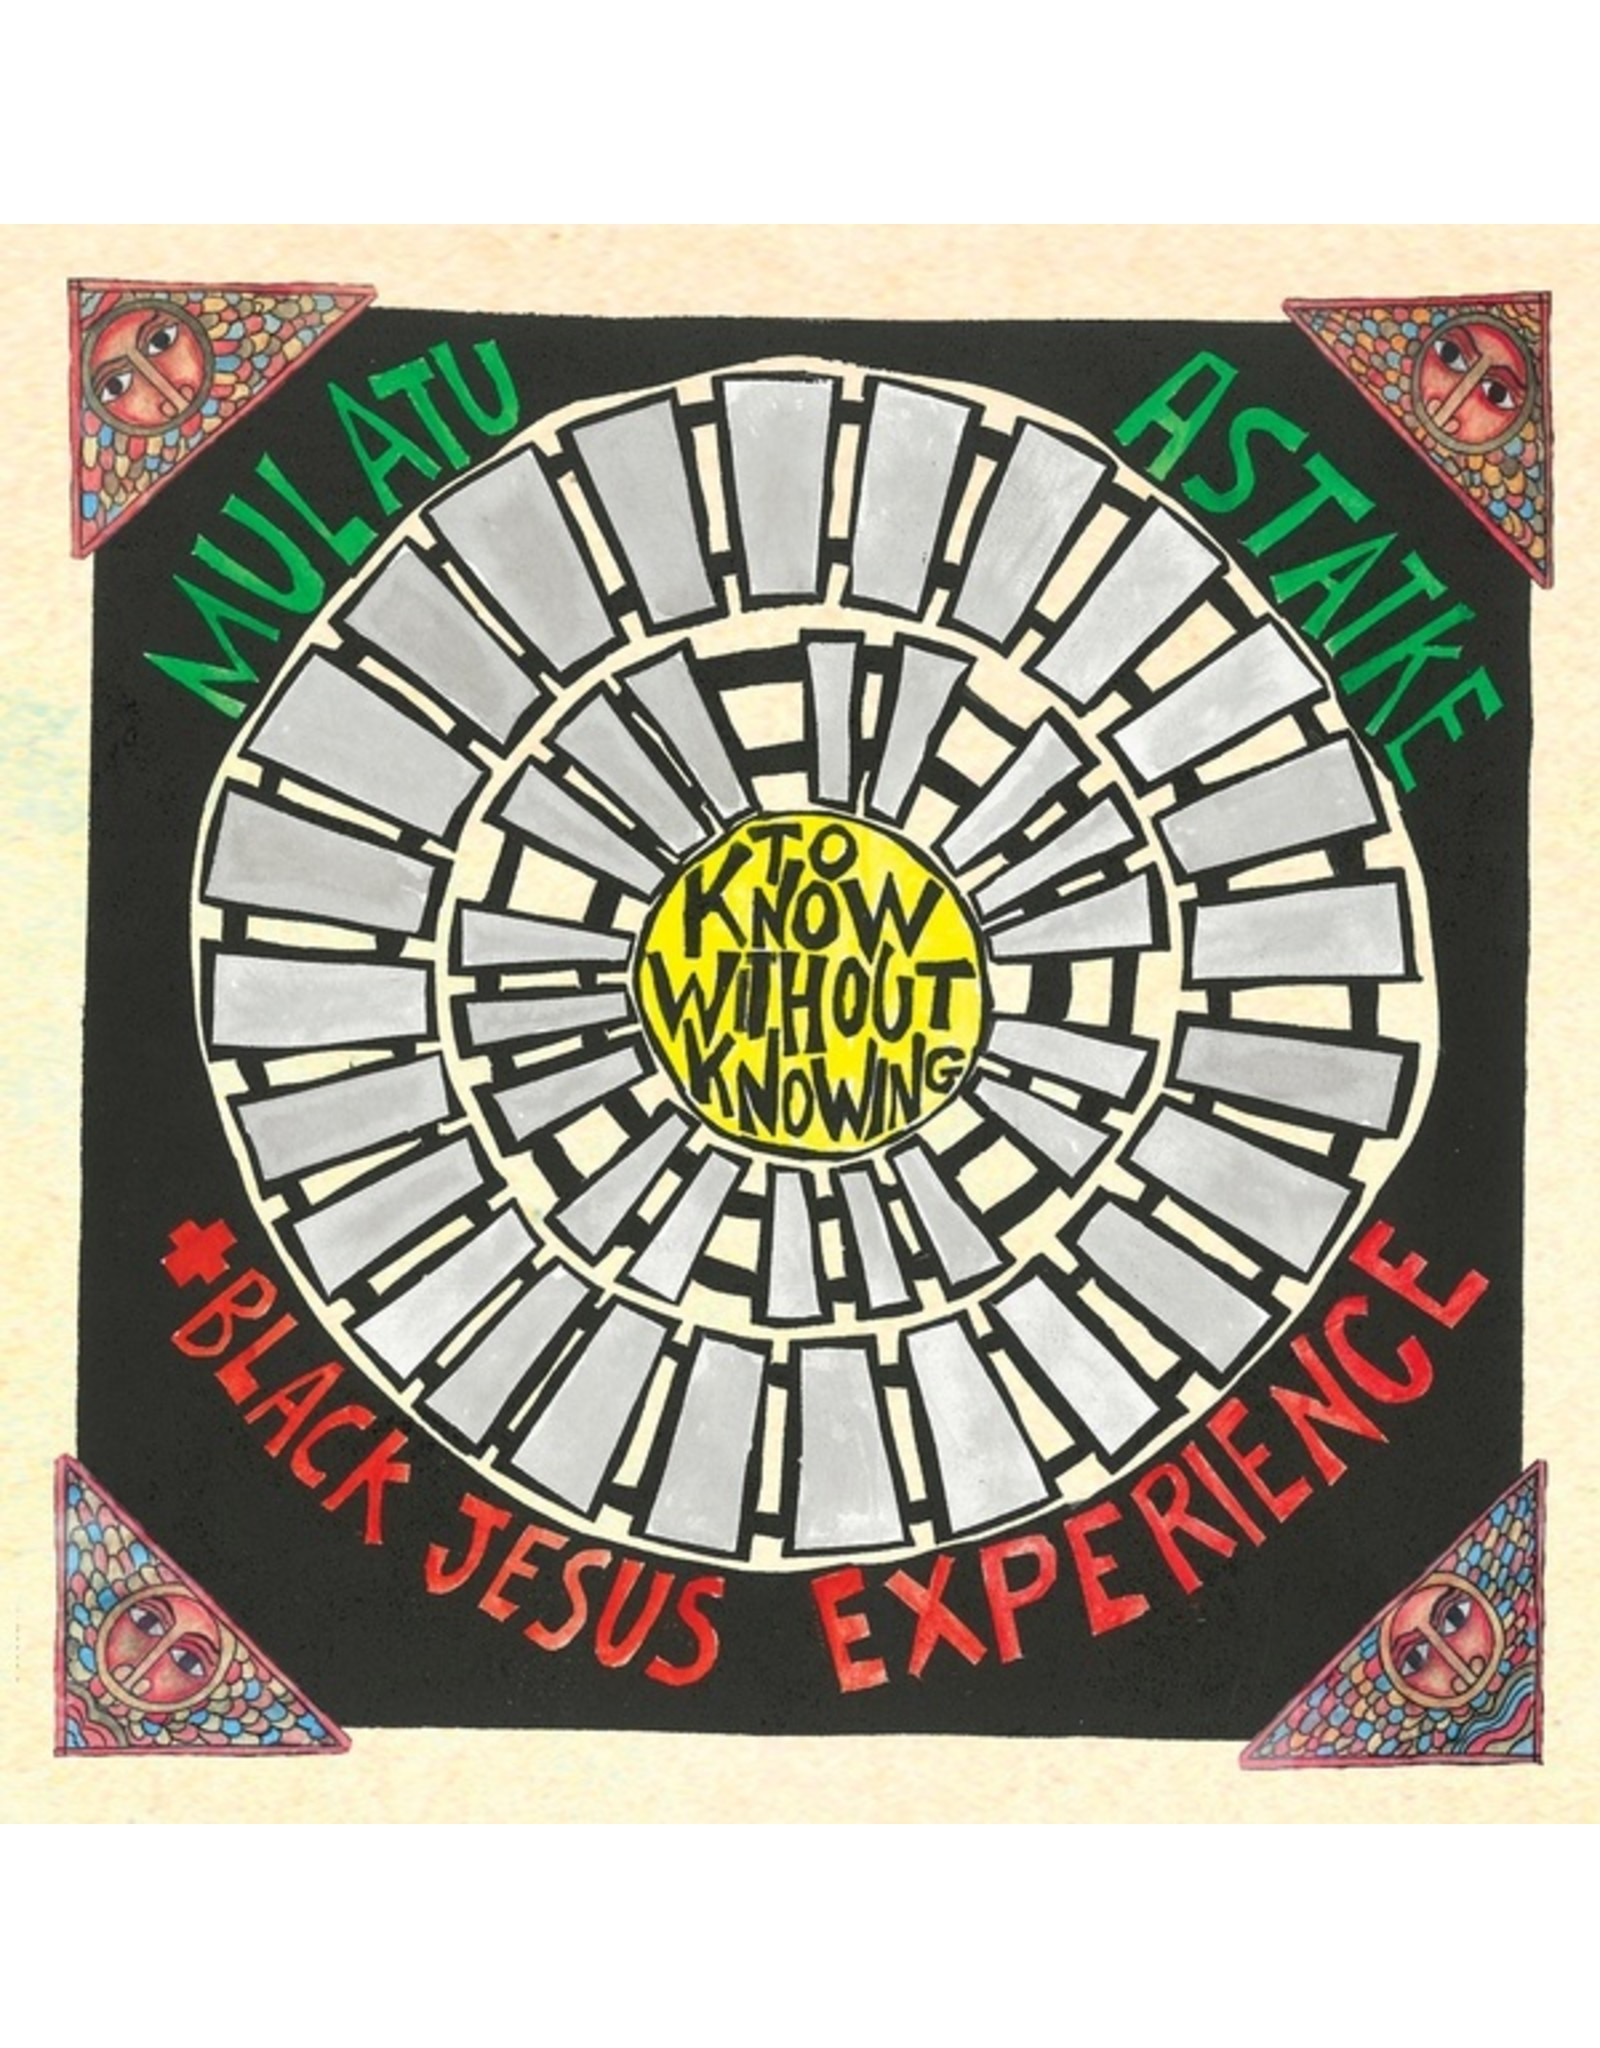 New Vinyl Mulatu Astatke & Black Jesus Experience - To Know Without Knowing LP